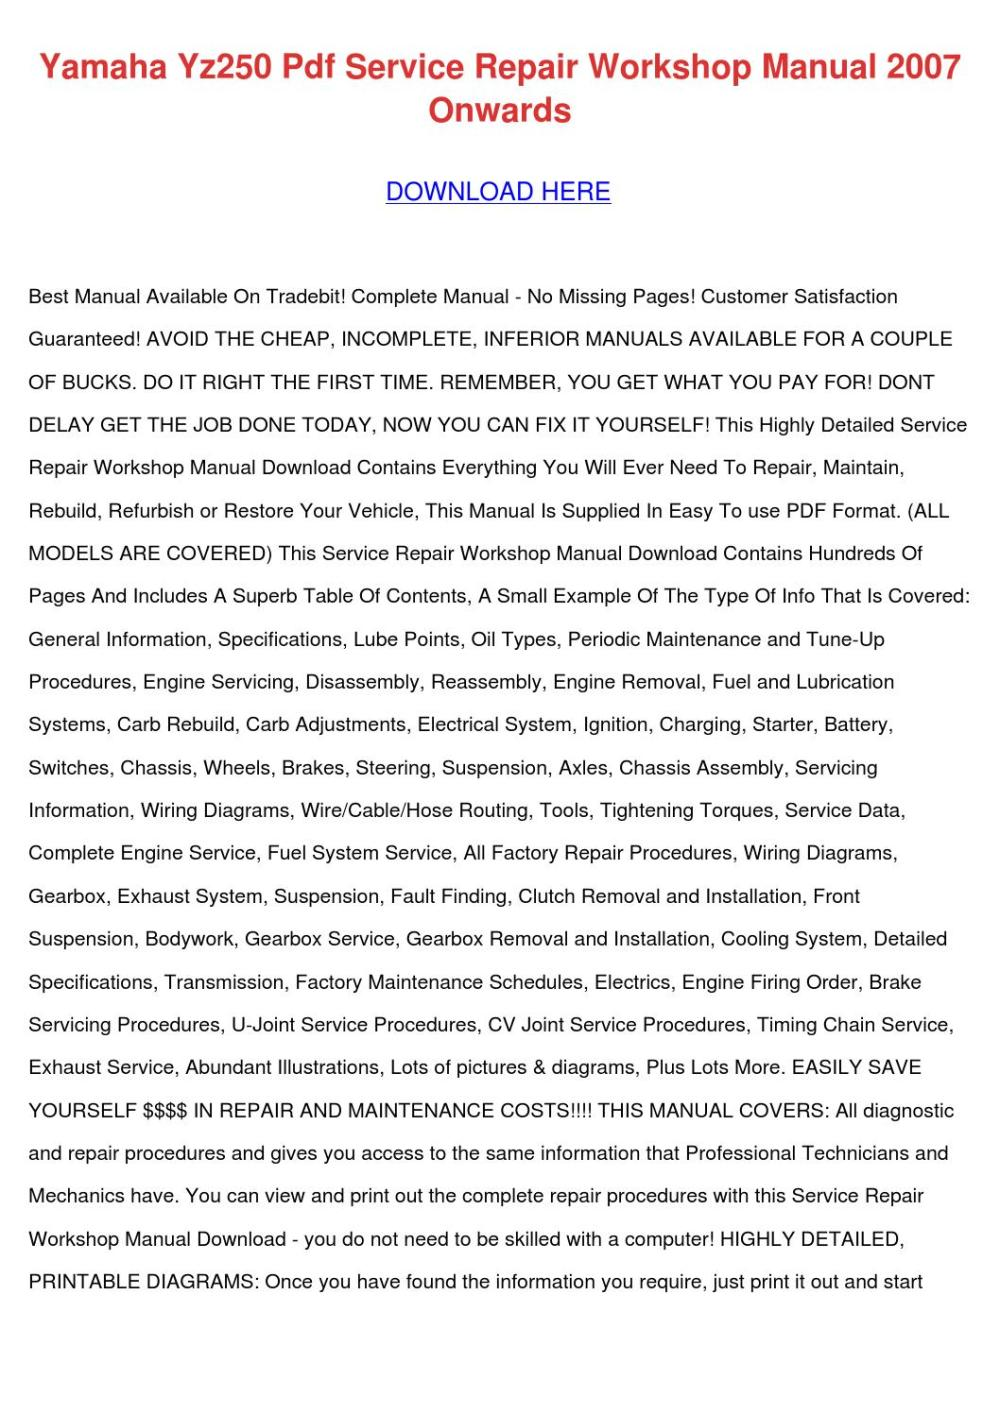 medium resolution of yamaha yz250 pdf service repair workshop manu by jocelynheard issuuyamaha yz250 pdf service repair workshop manu